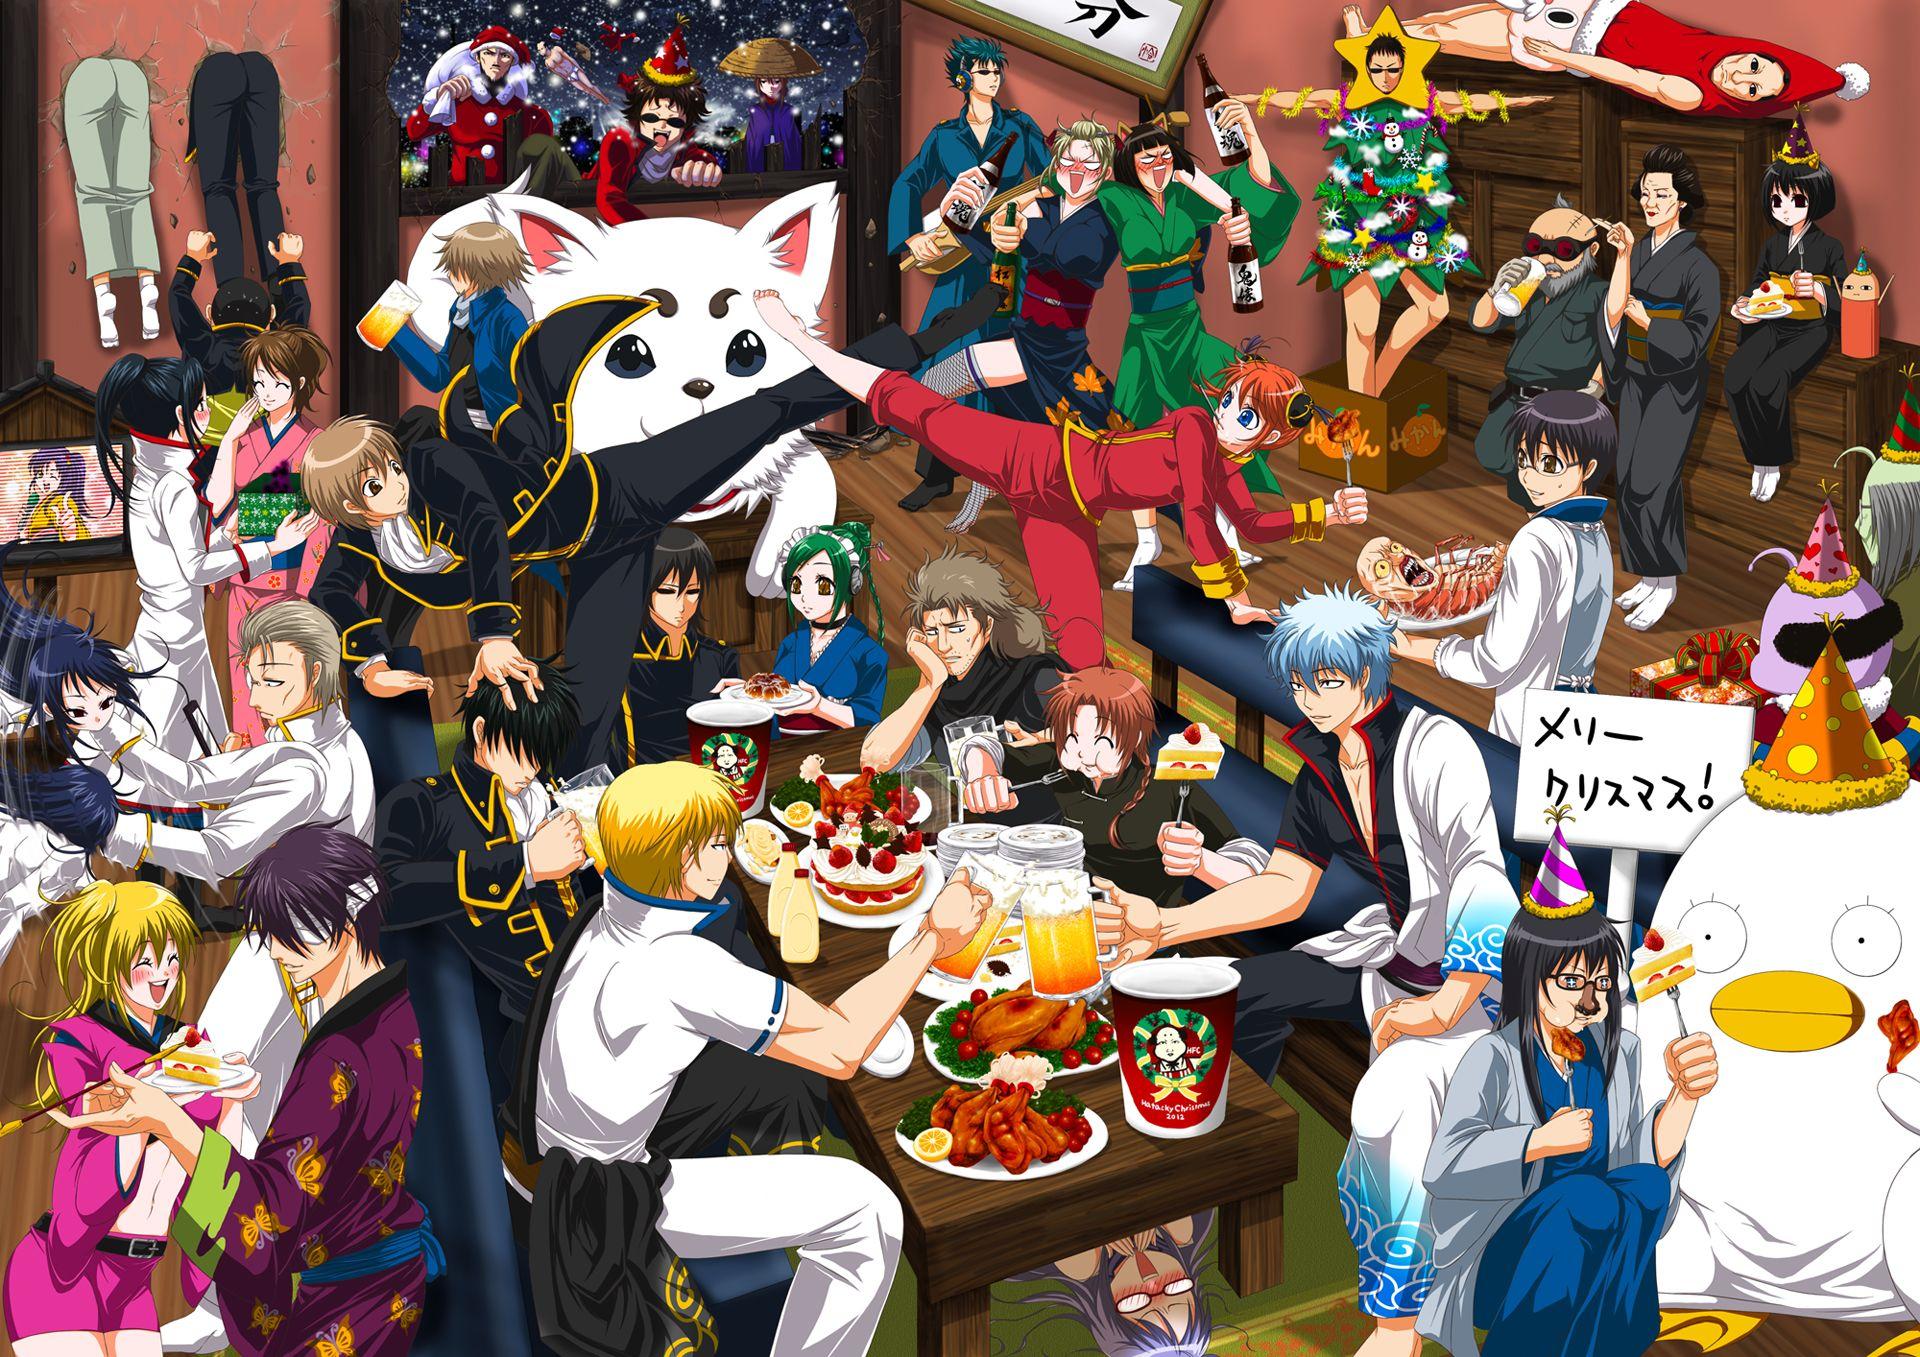 Gintama wallpaper Anime Pinterest Wallpaper and Anime